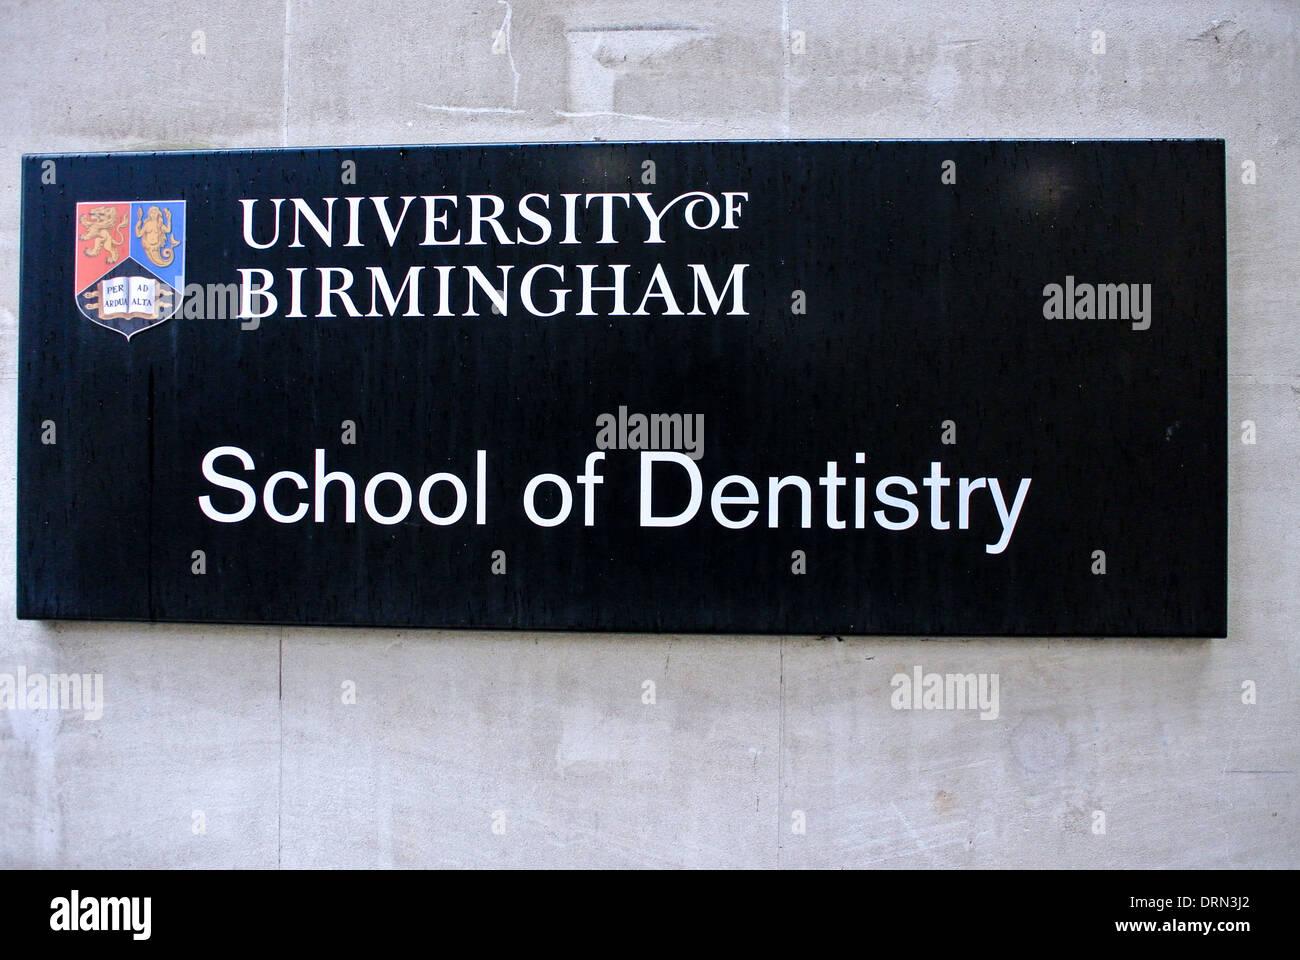 Dentistry School sign Birmingham University - Stock Image